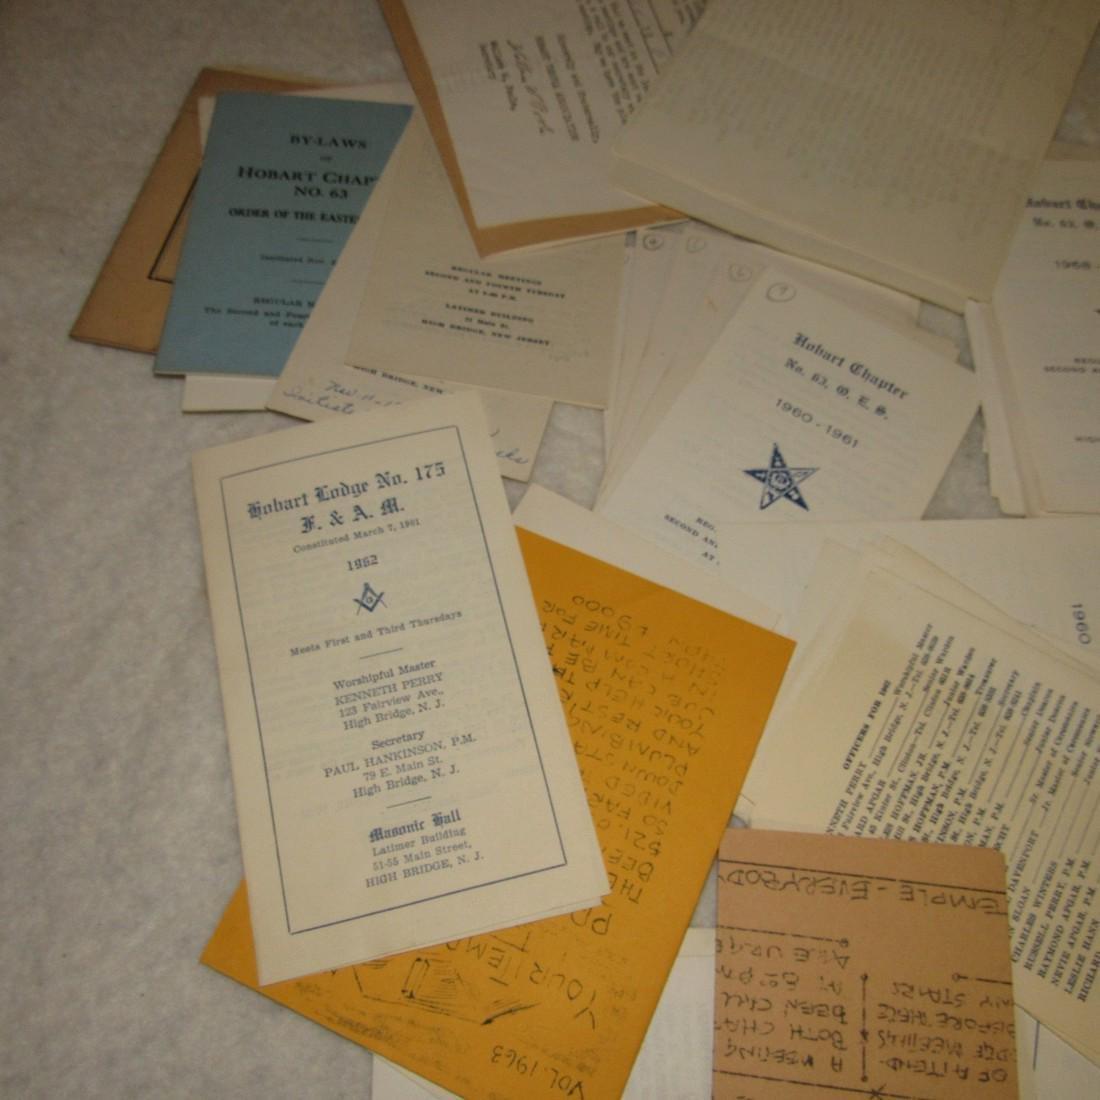 Hobart Lodge Masonic Literature Lot - 3